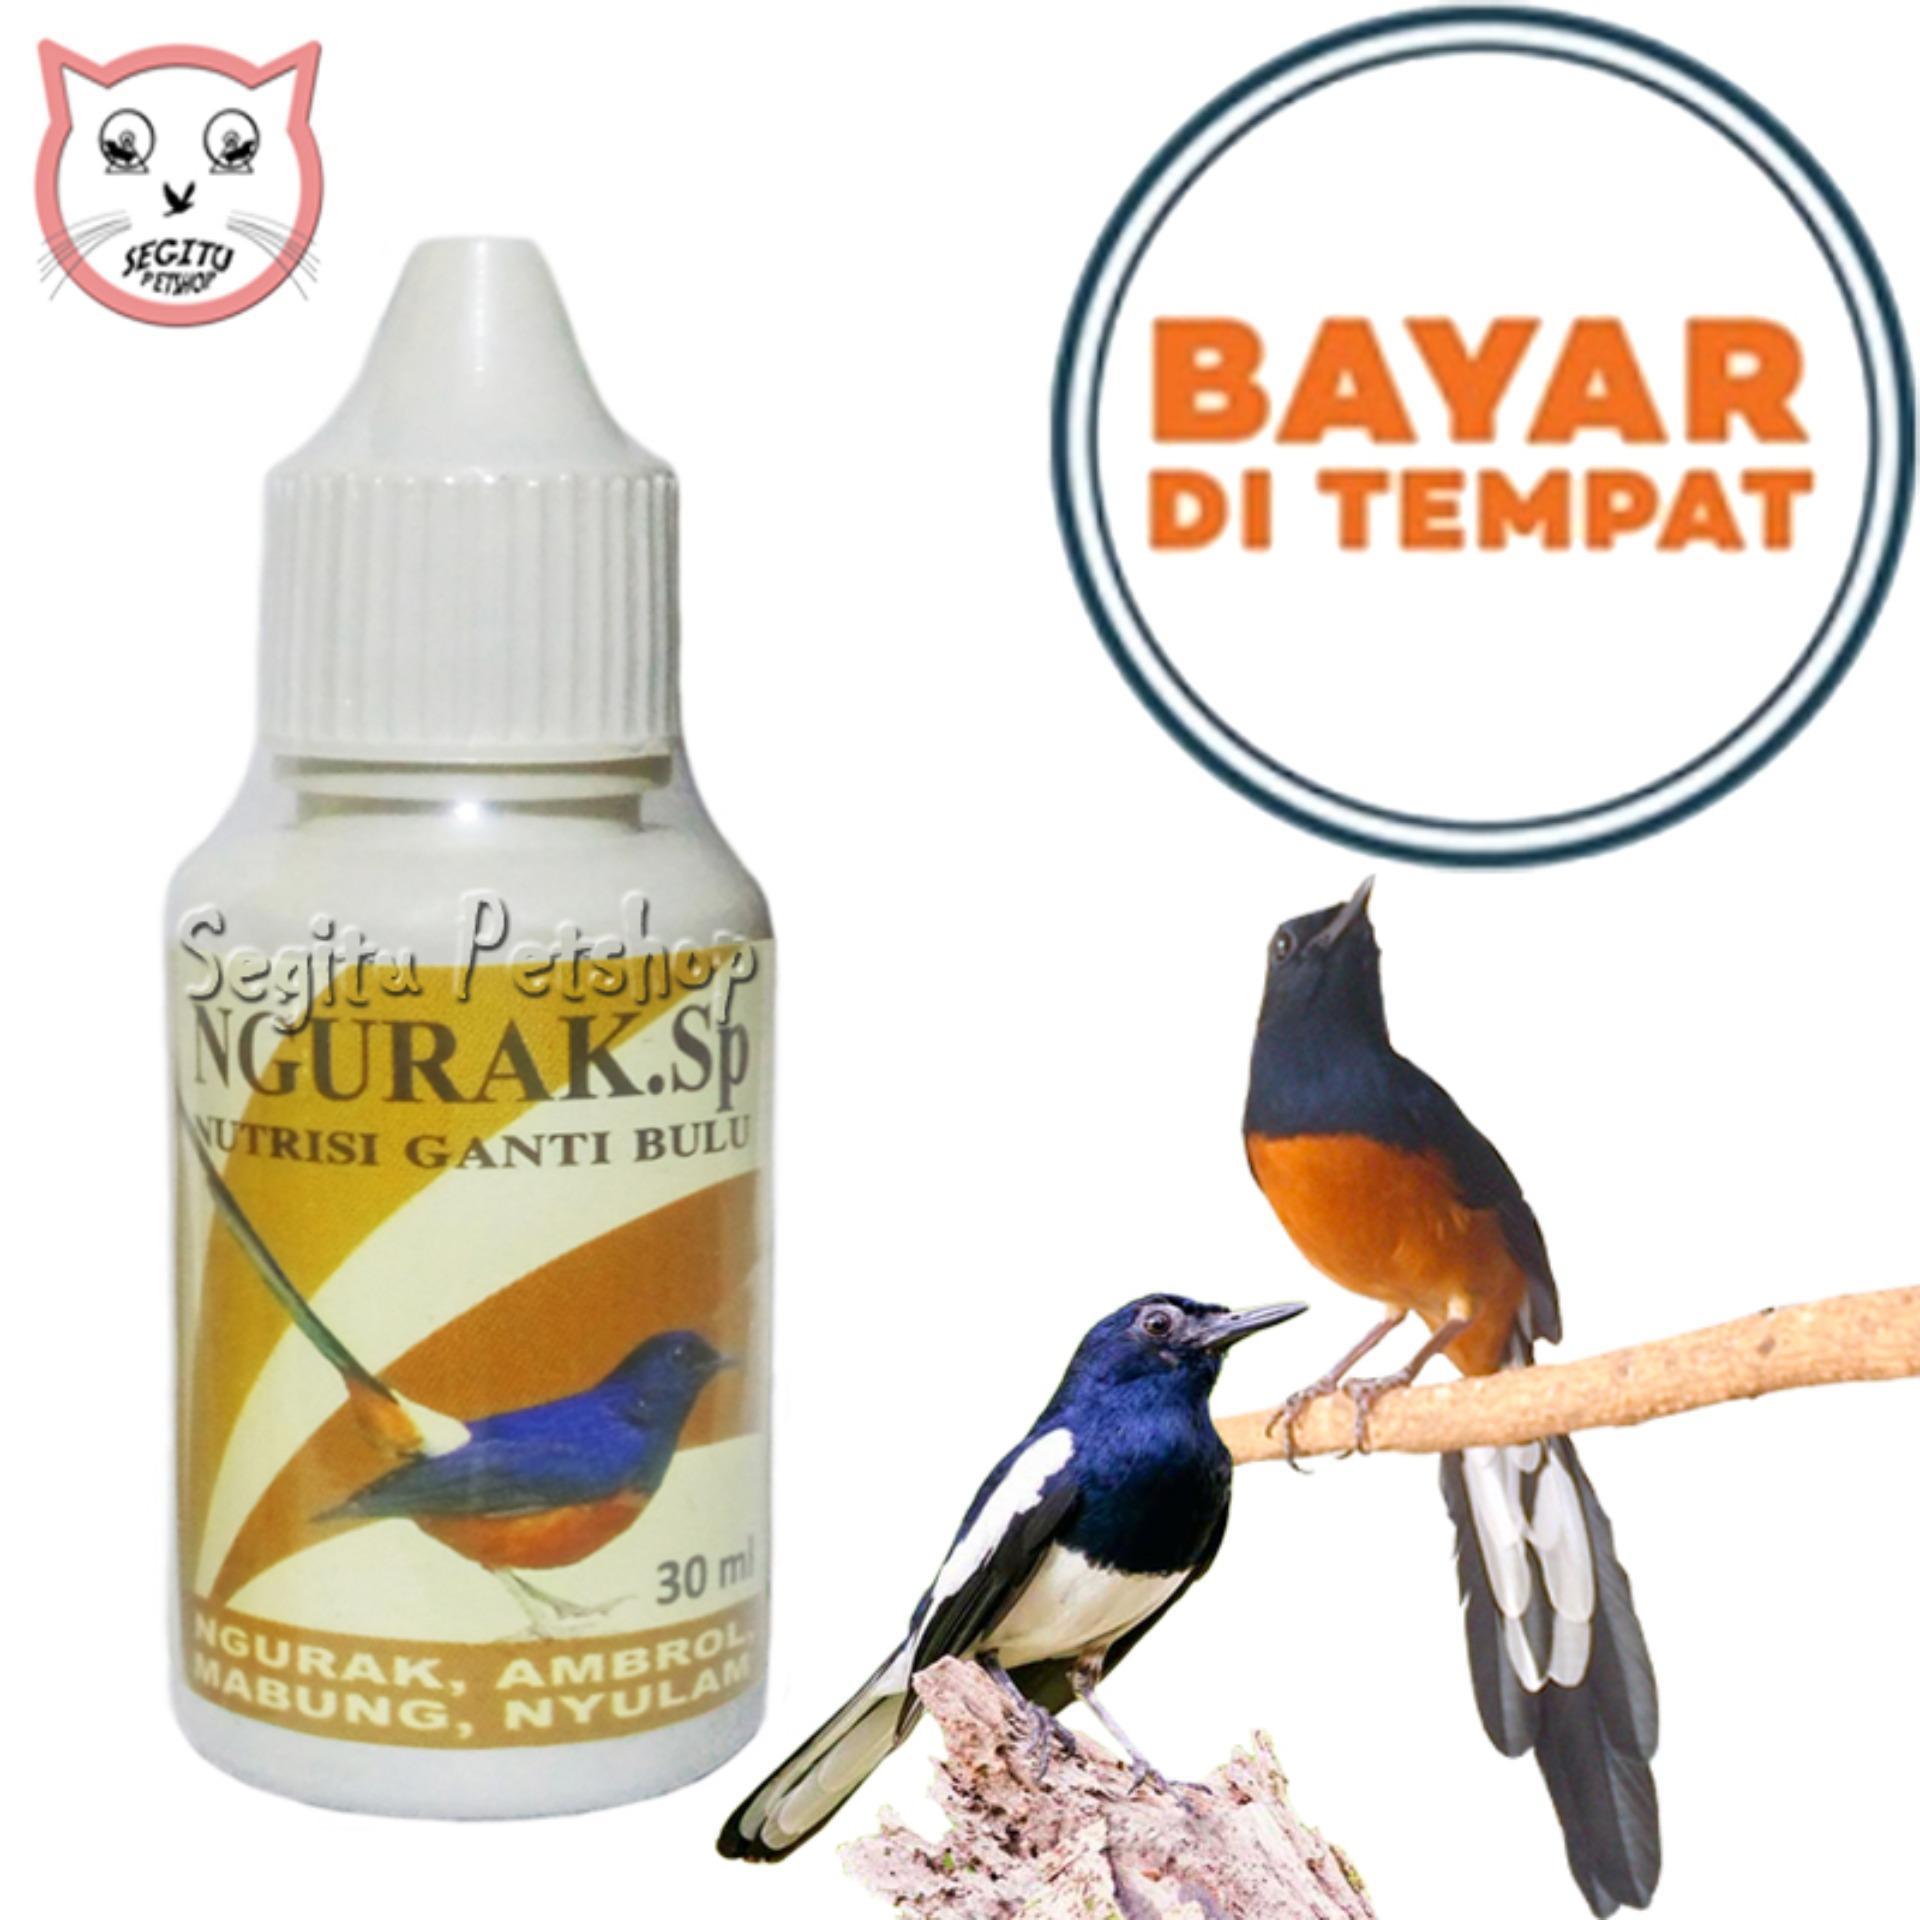 Obat Vitamin Burung Kicau Mabung Ngurak Lazada Indonesia